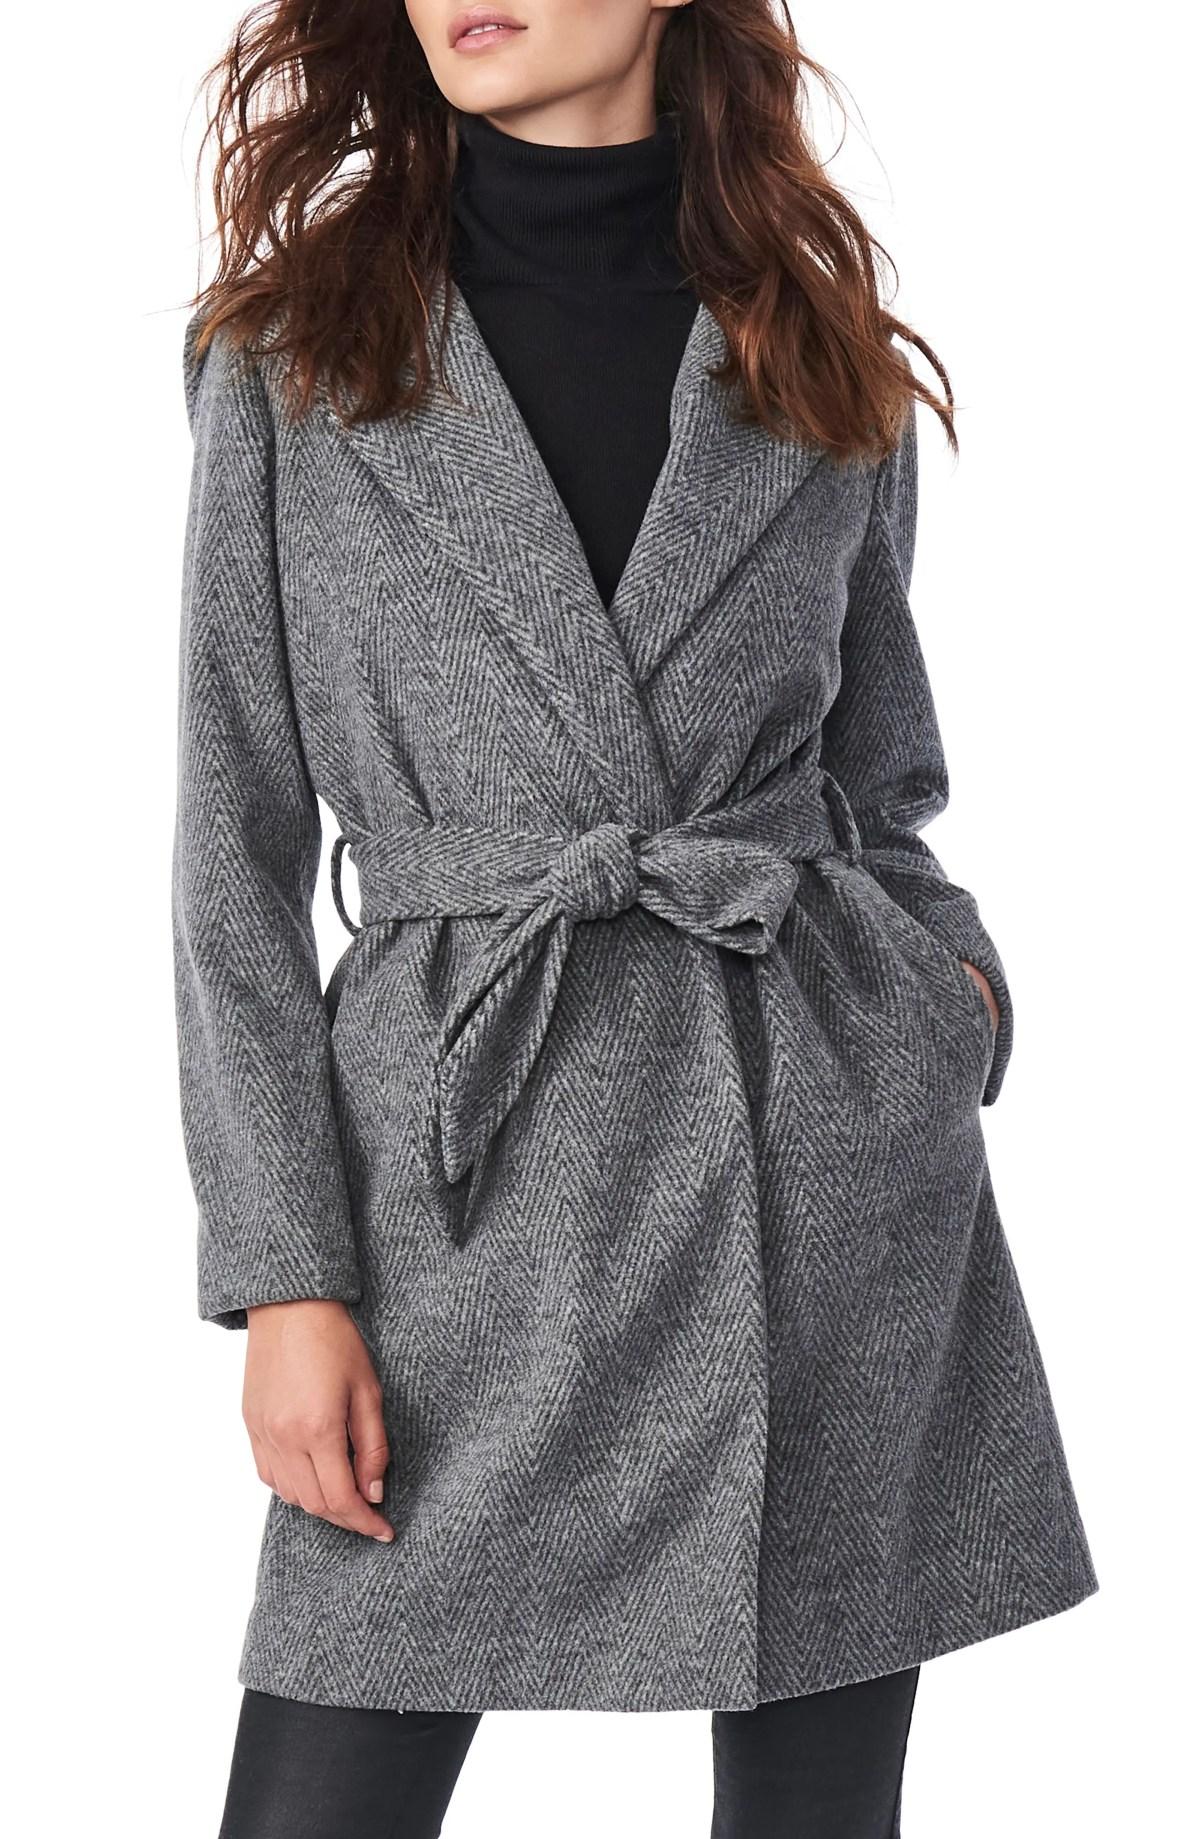 BERNARDO Herringbone Belted Hooded Wrap Coat, Main, color, GREY HERRINGBONE